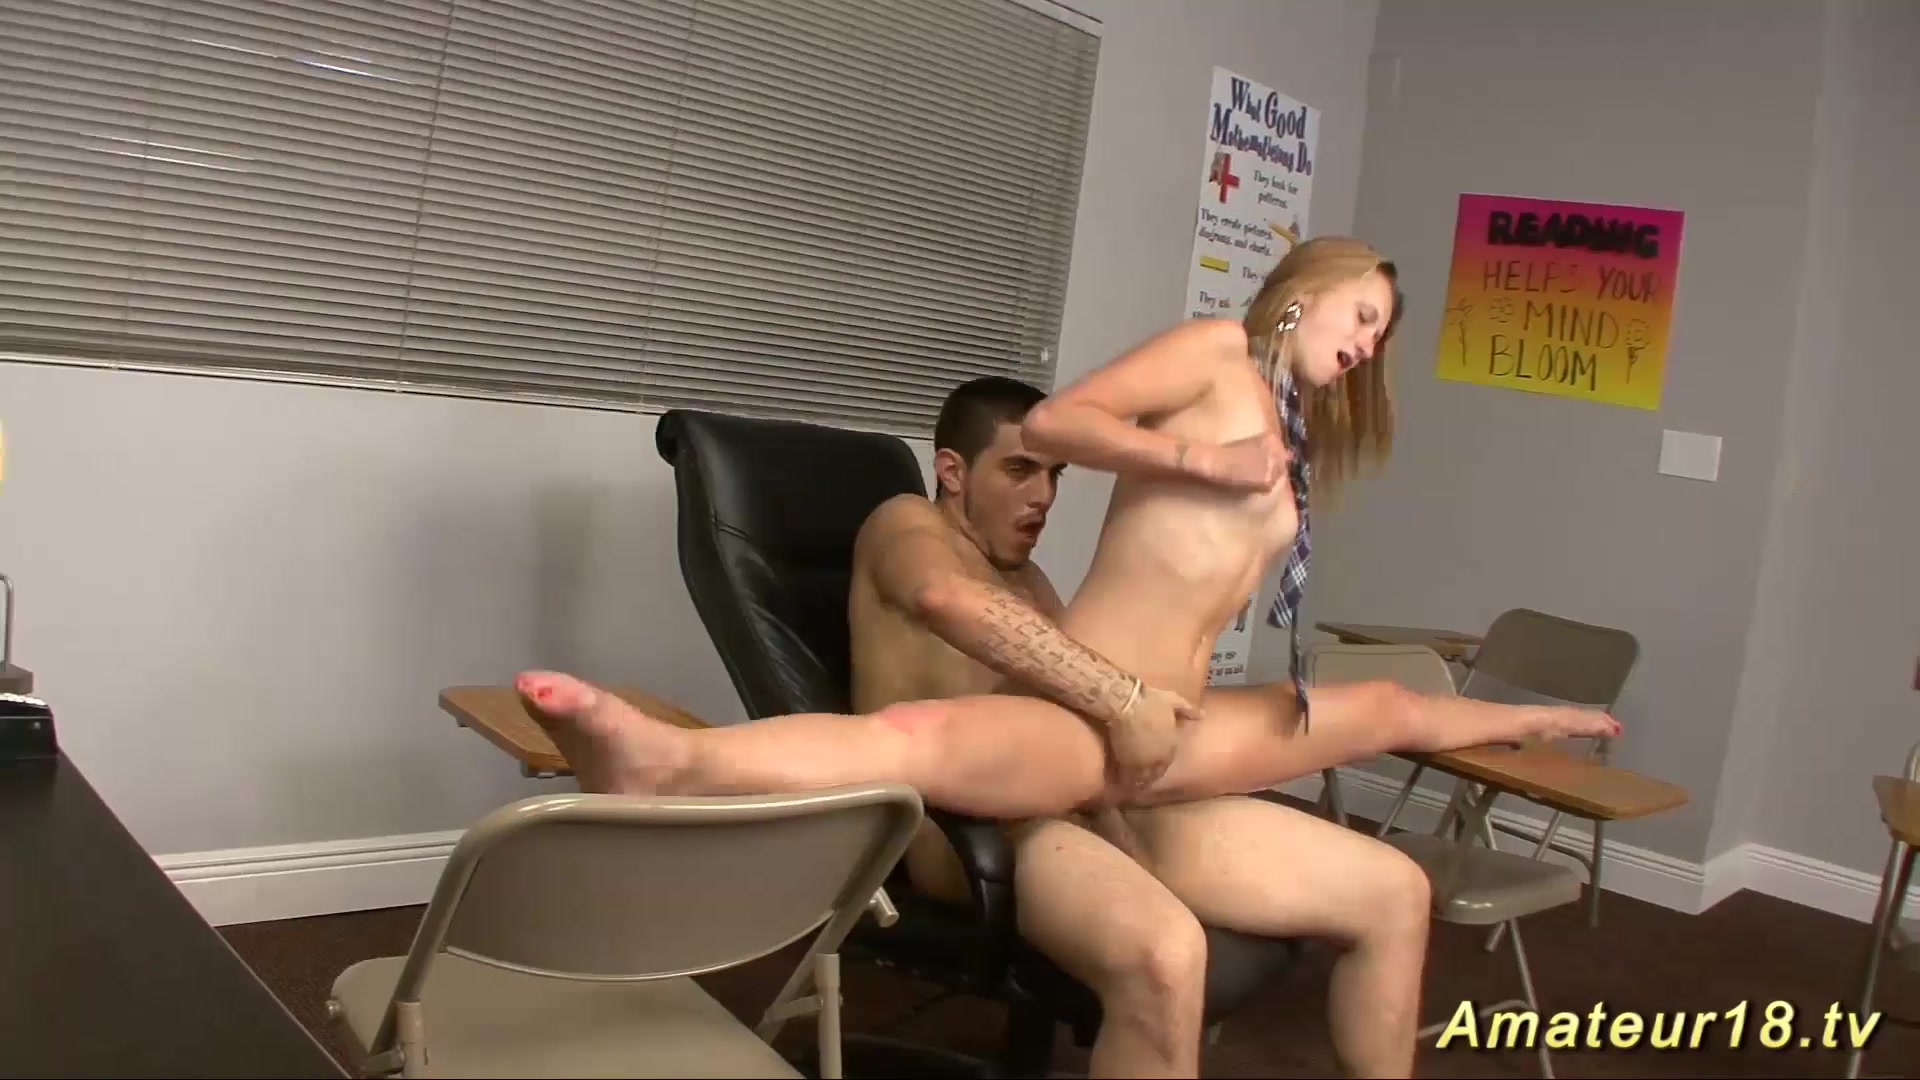 Naked Porn tube Dating dashboard